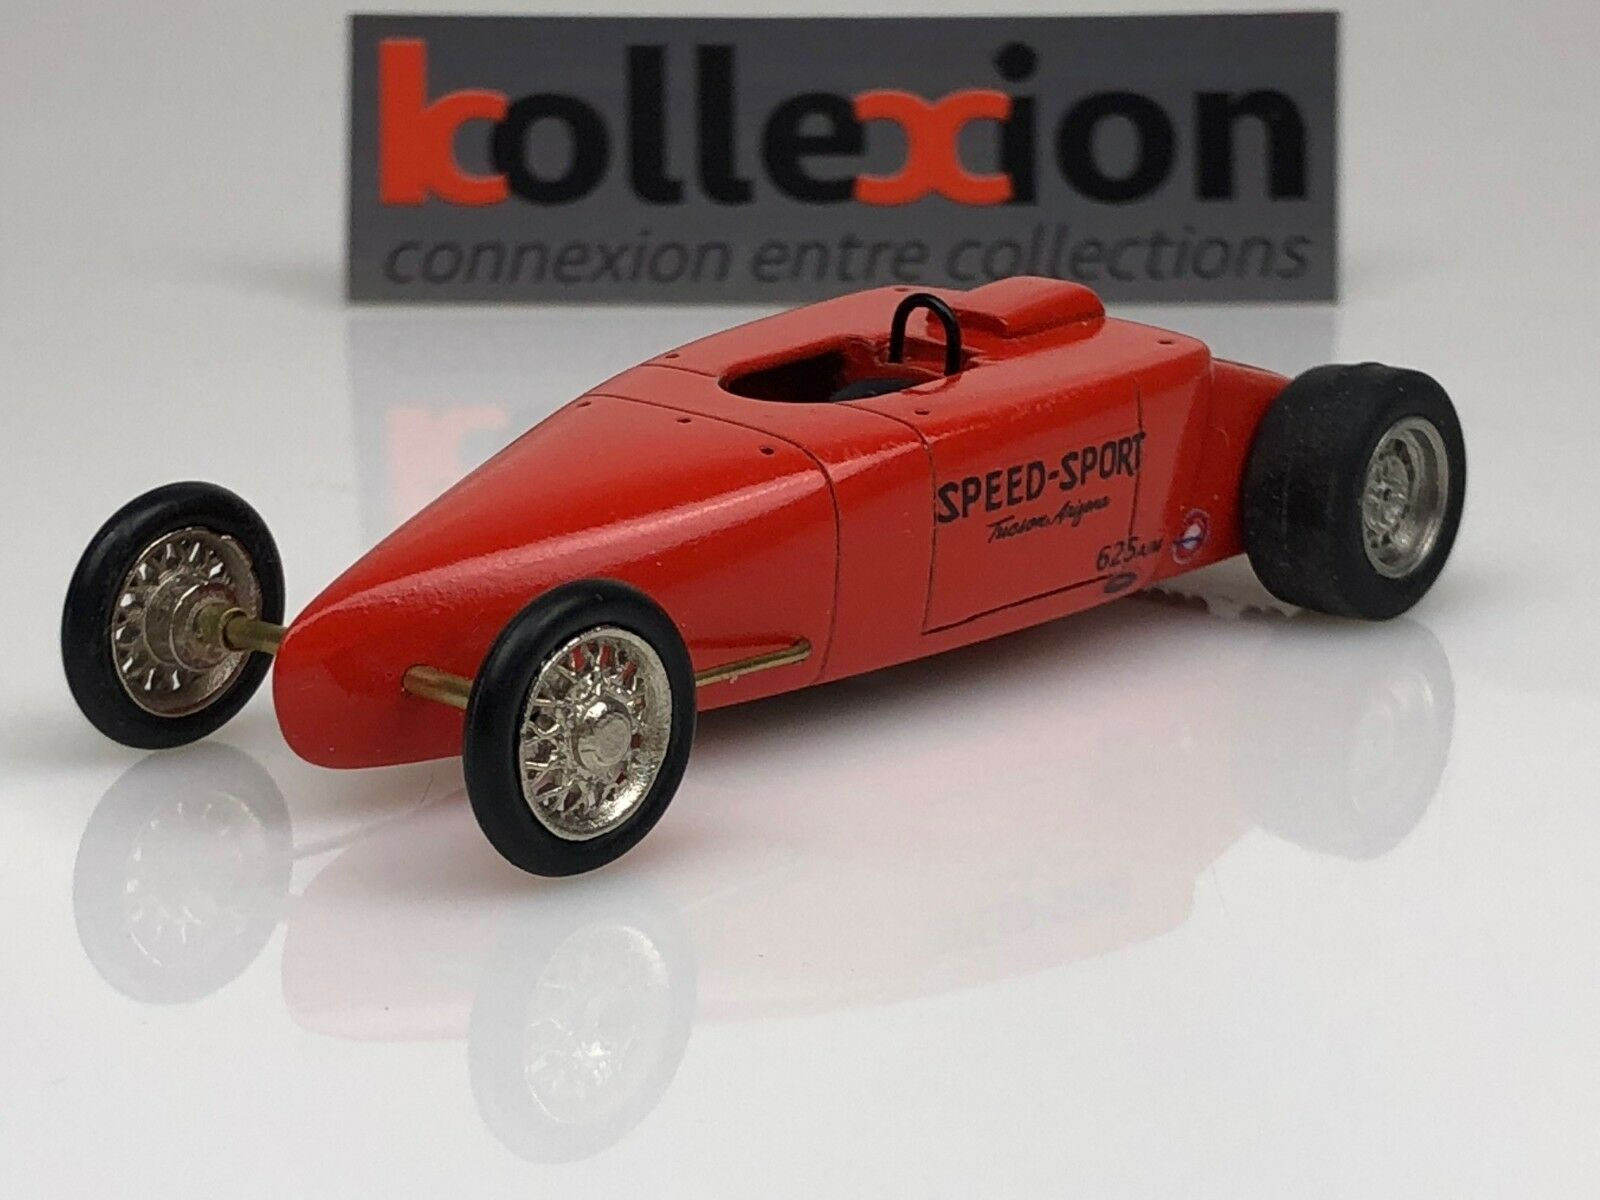 Frot carrillo roadster velocit à sport - version 1999 1,43